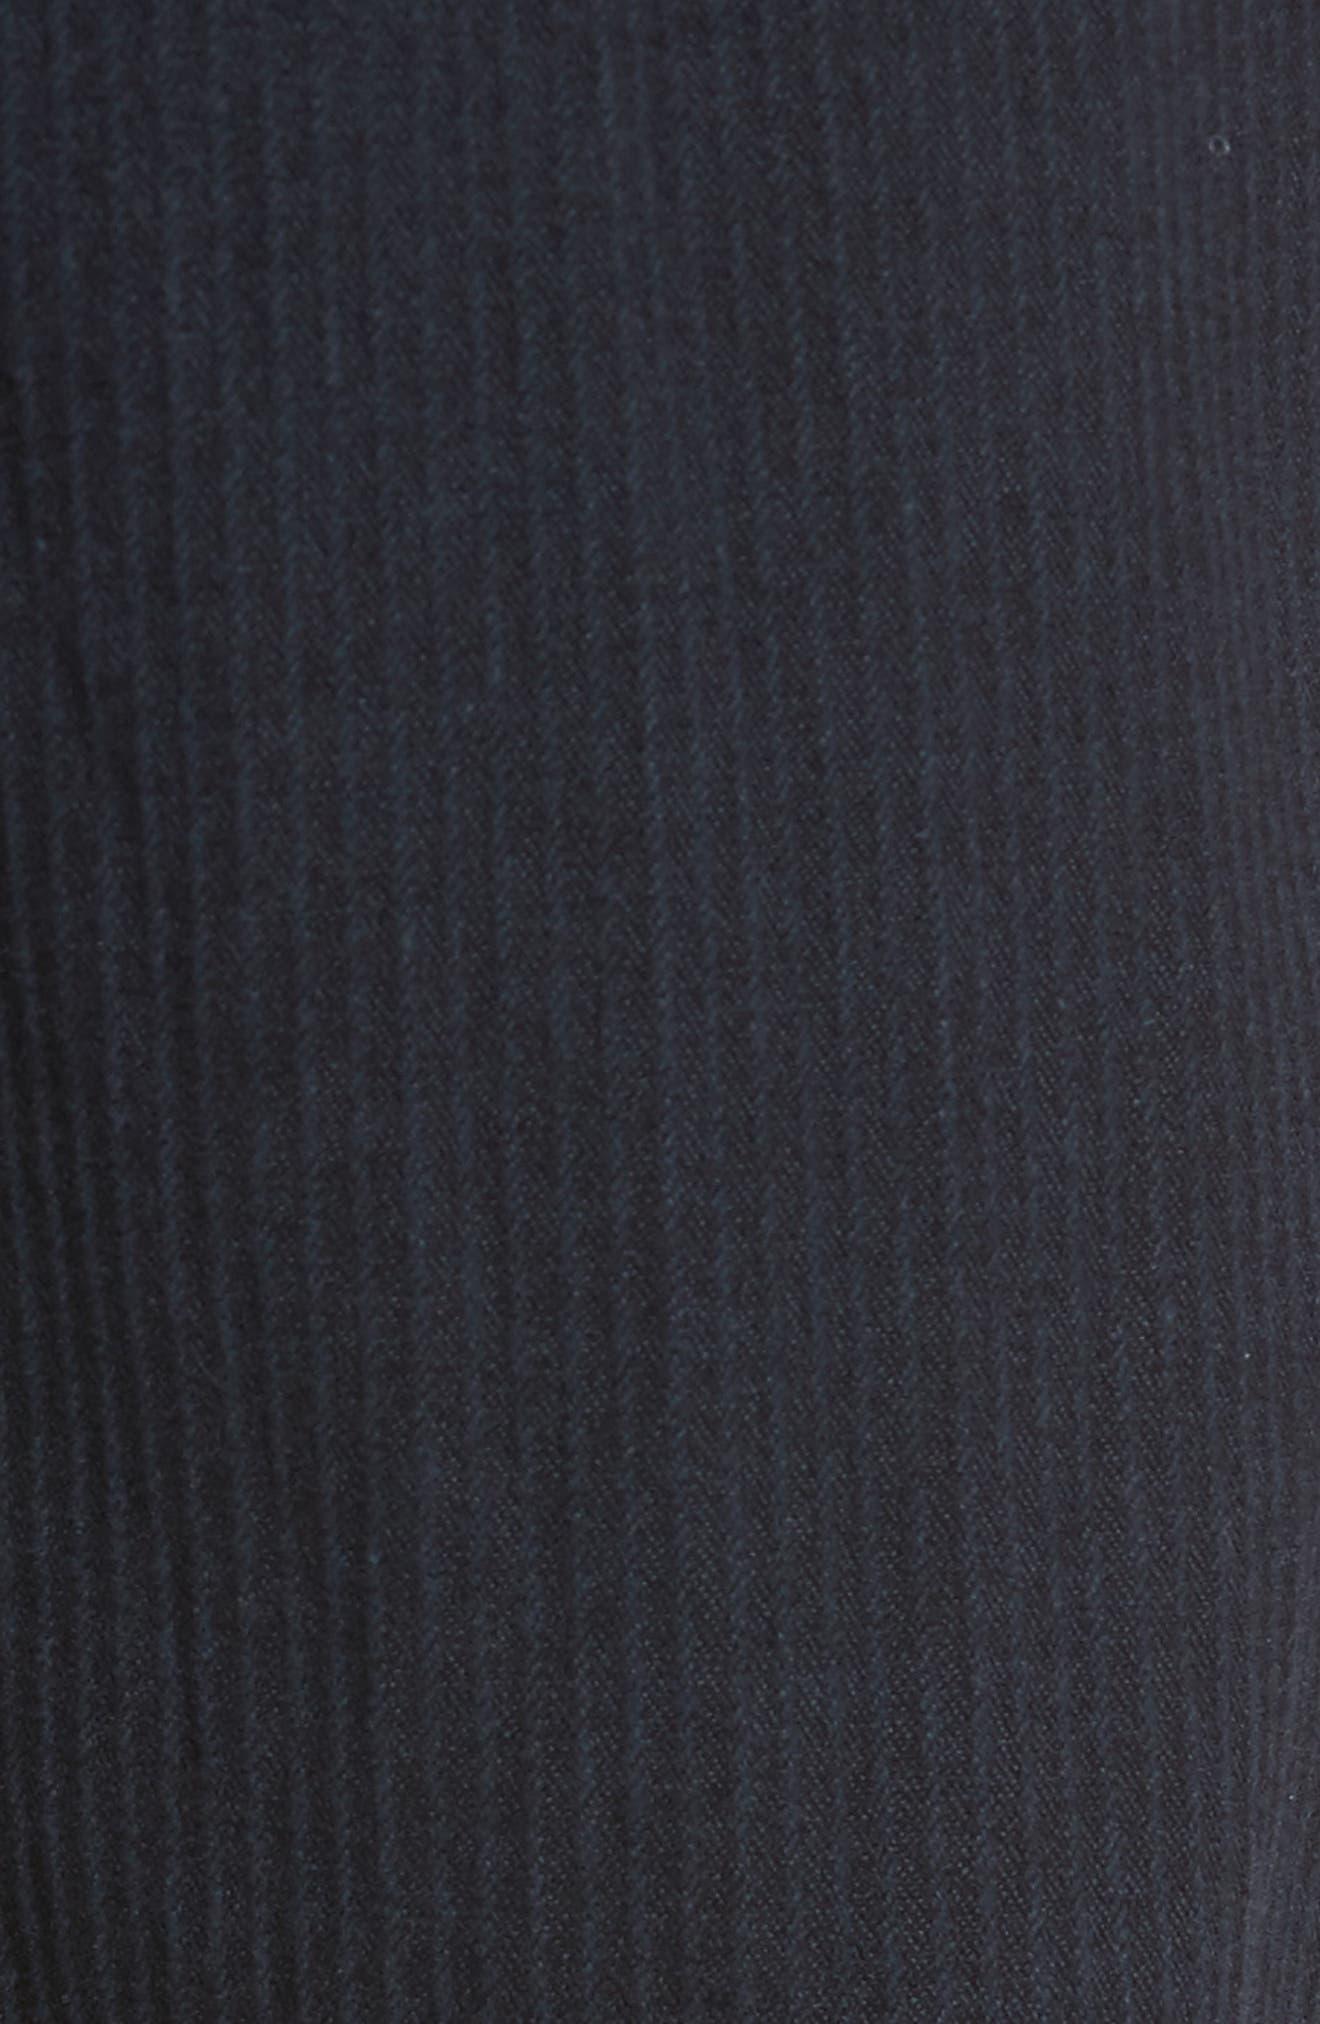 Tellis Modern Slim Stripe Five-Pocket Pants,                             Alternate thumbnail 5, color,                             Midnight Shadow